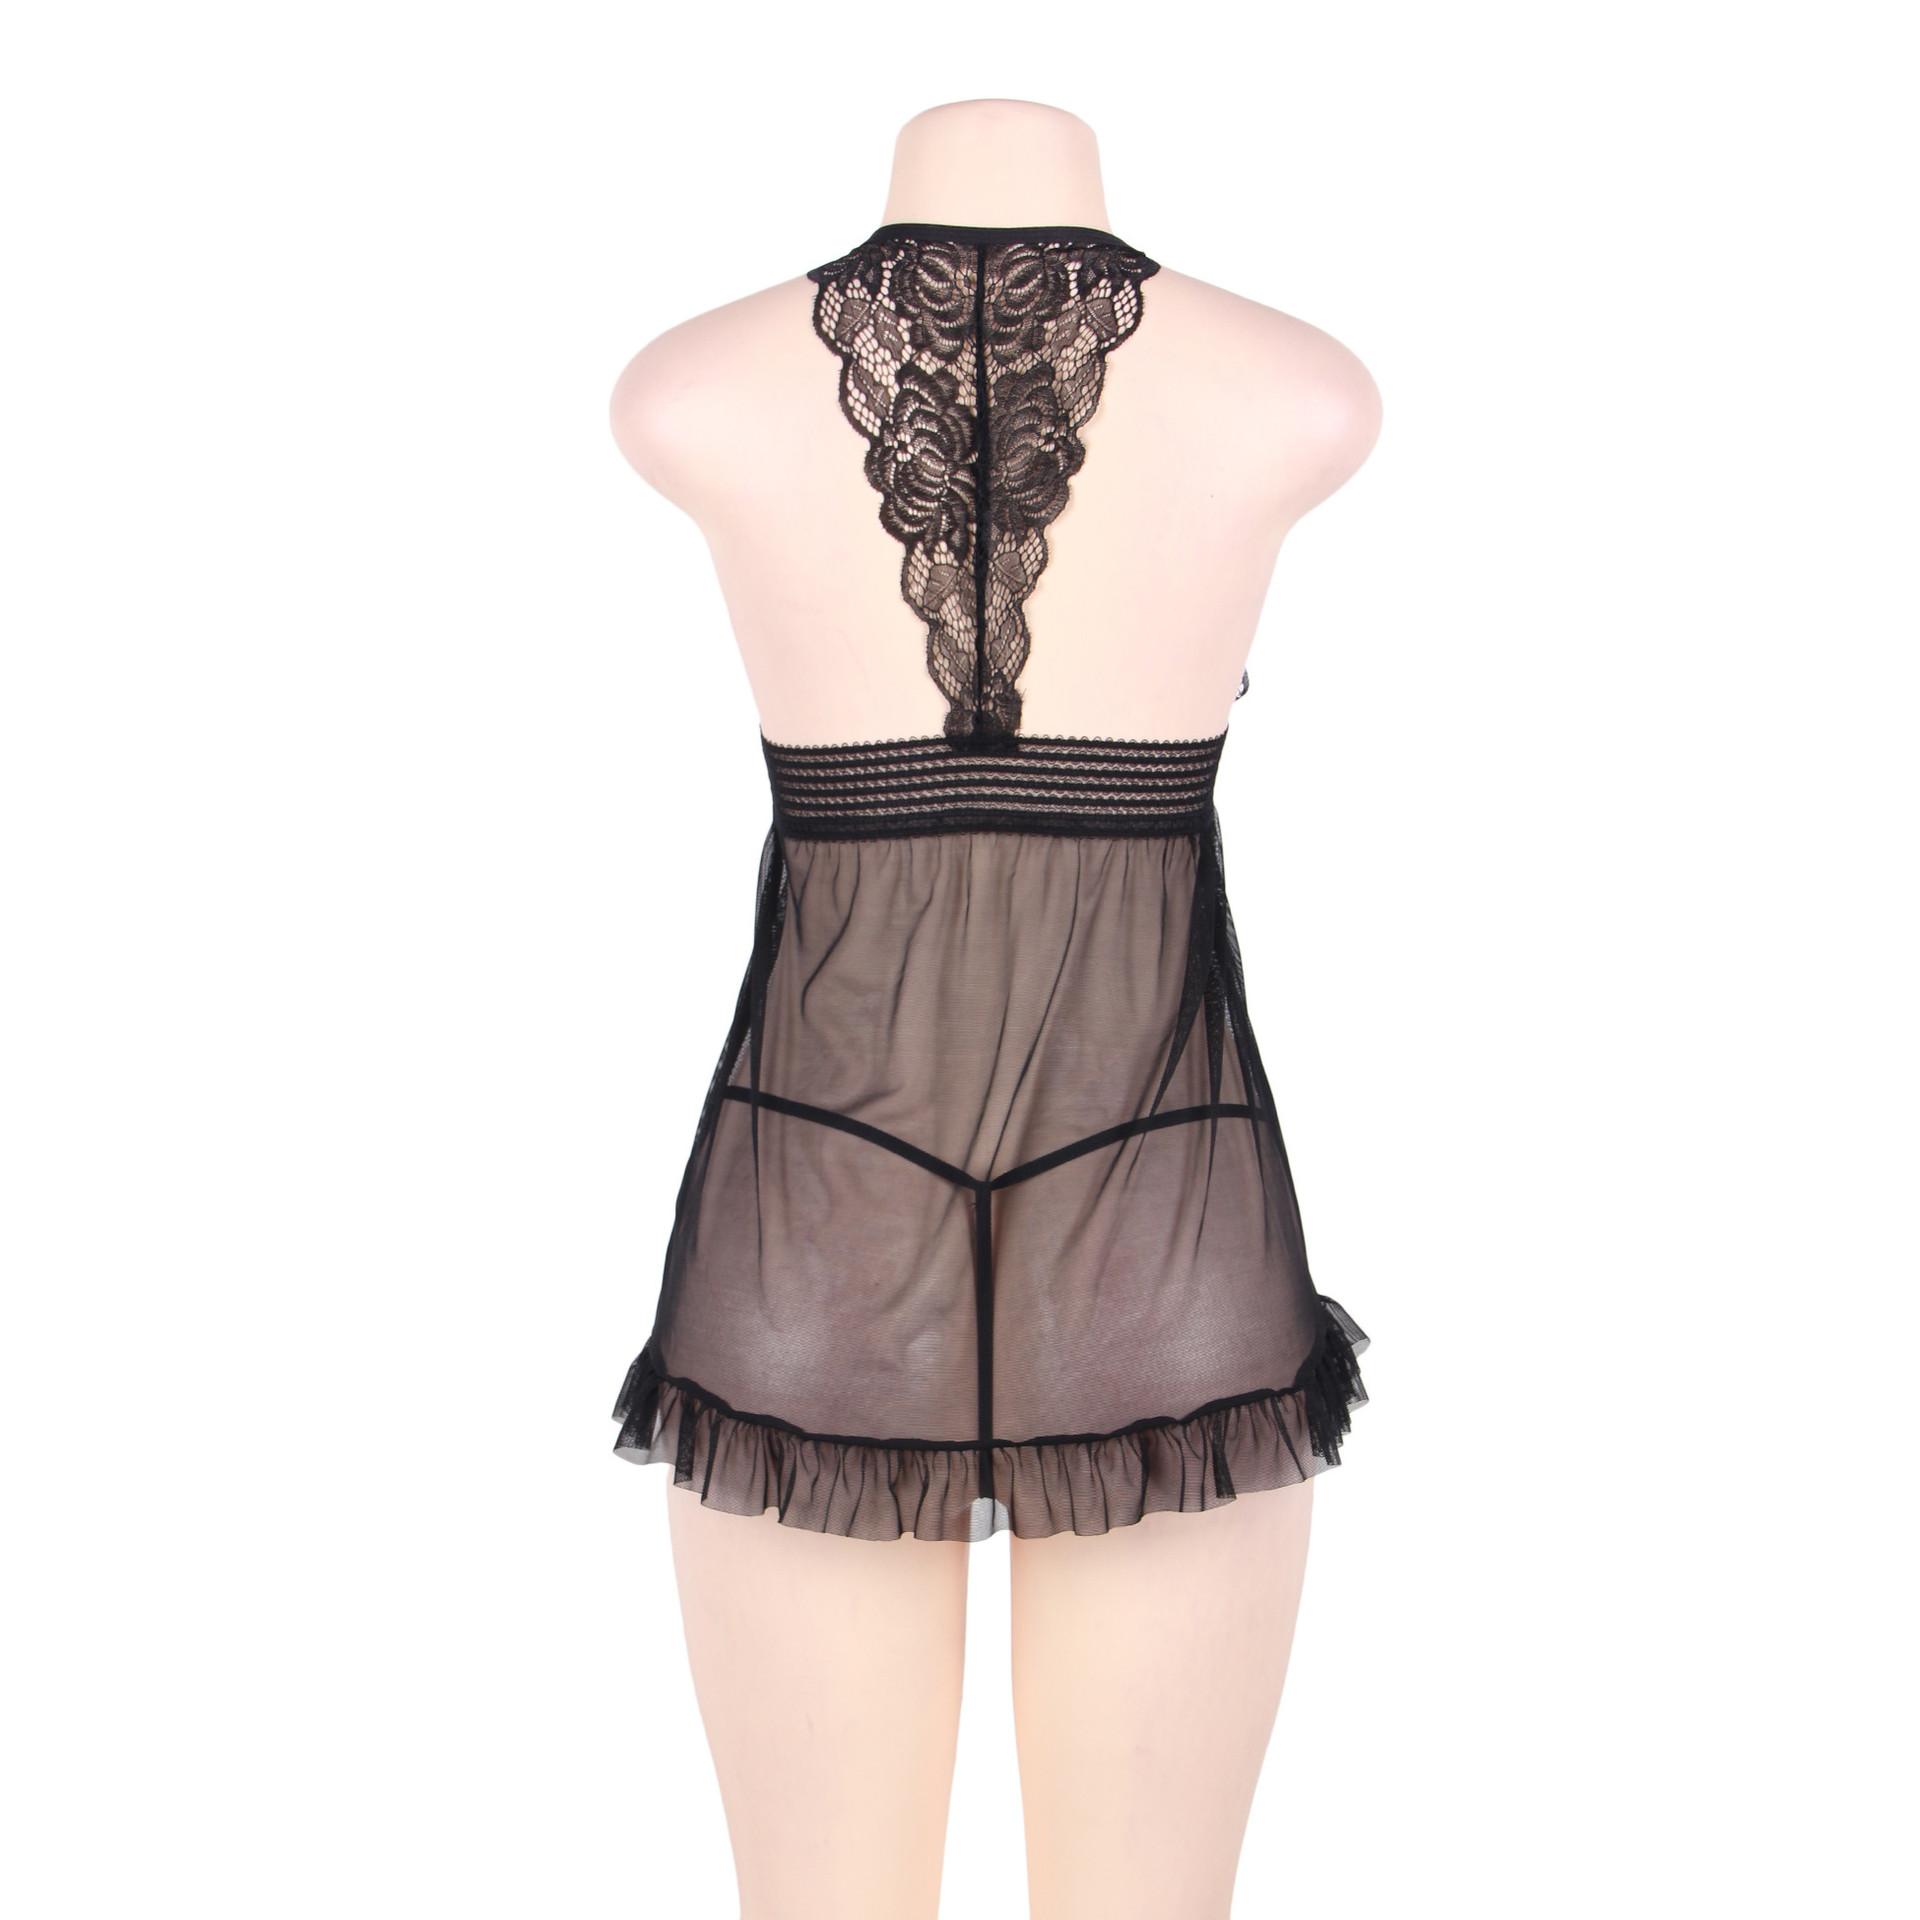 Women's Clothing Audacious Seven Til Midnight Flashy Cage Seamless Dress Black